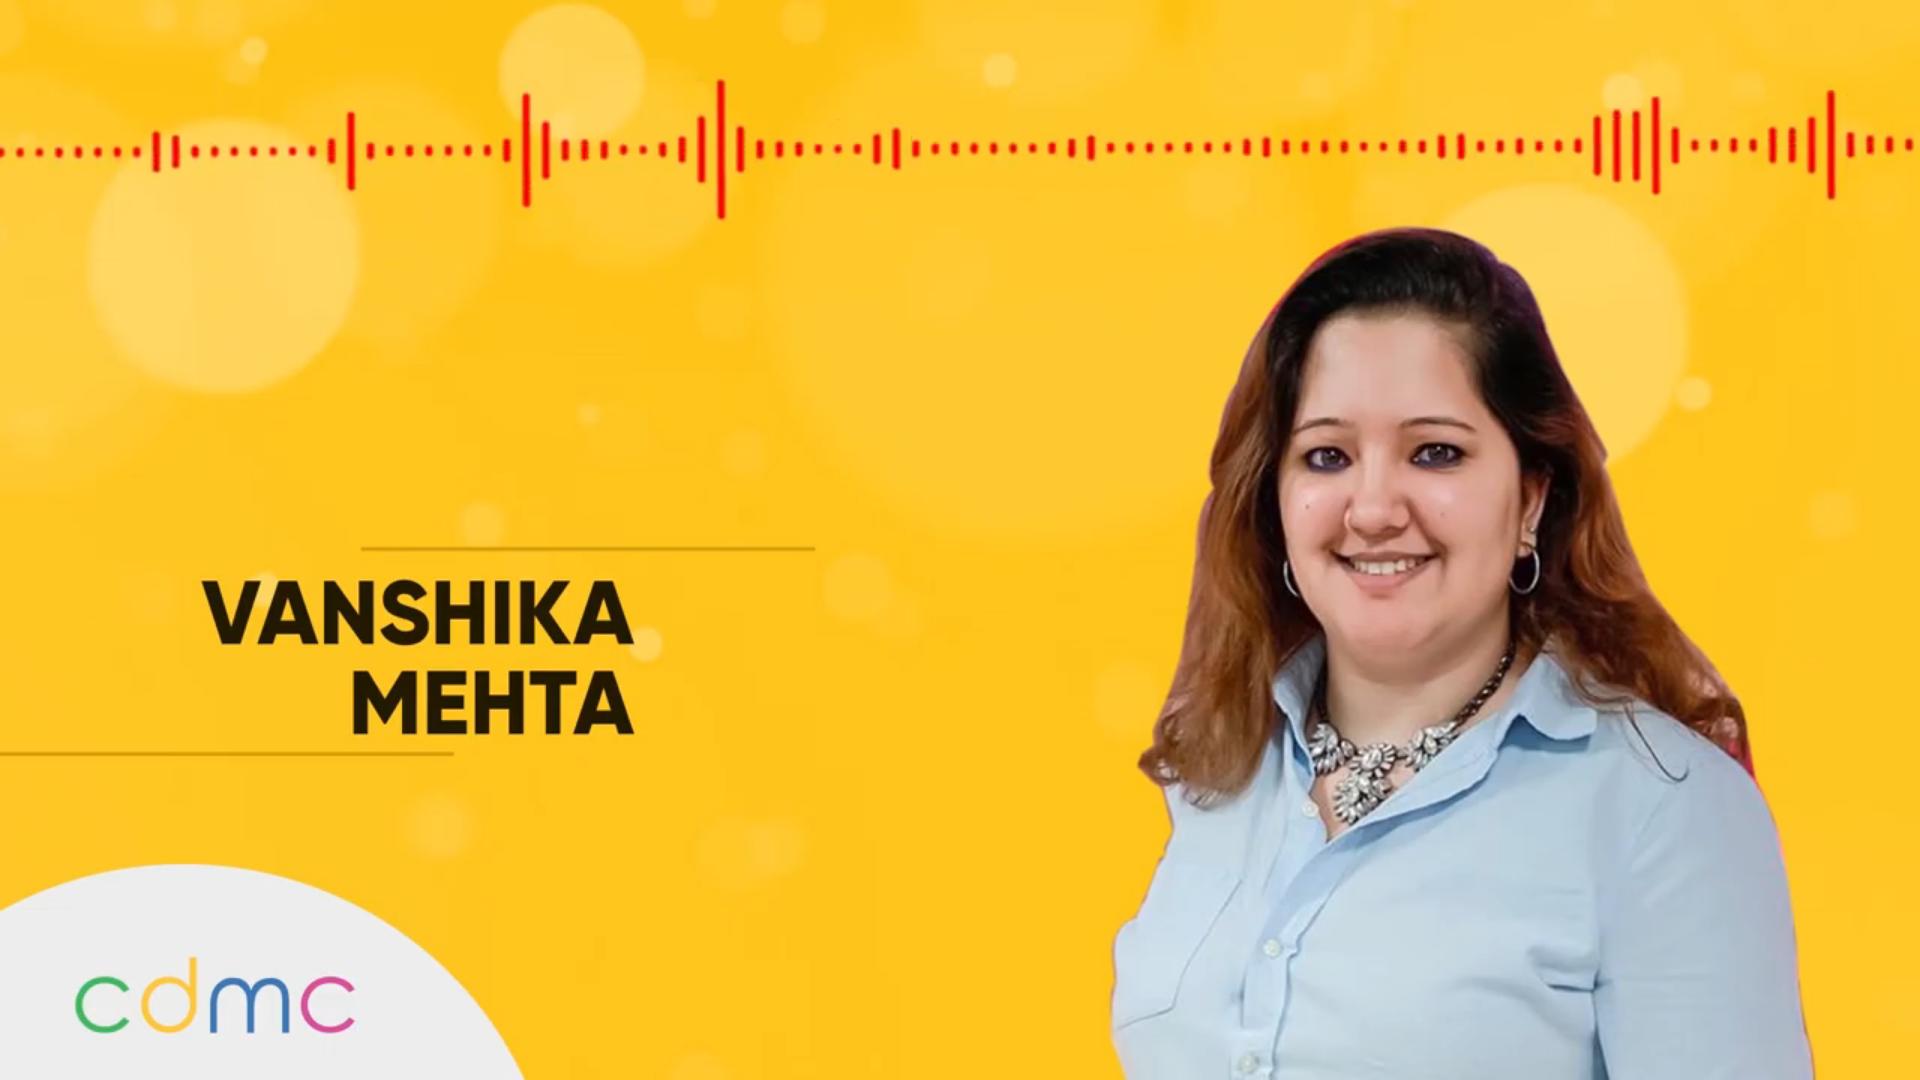 CDMC – Abhishek Singh in conversation with Vanshika Mehta